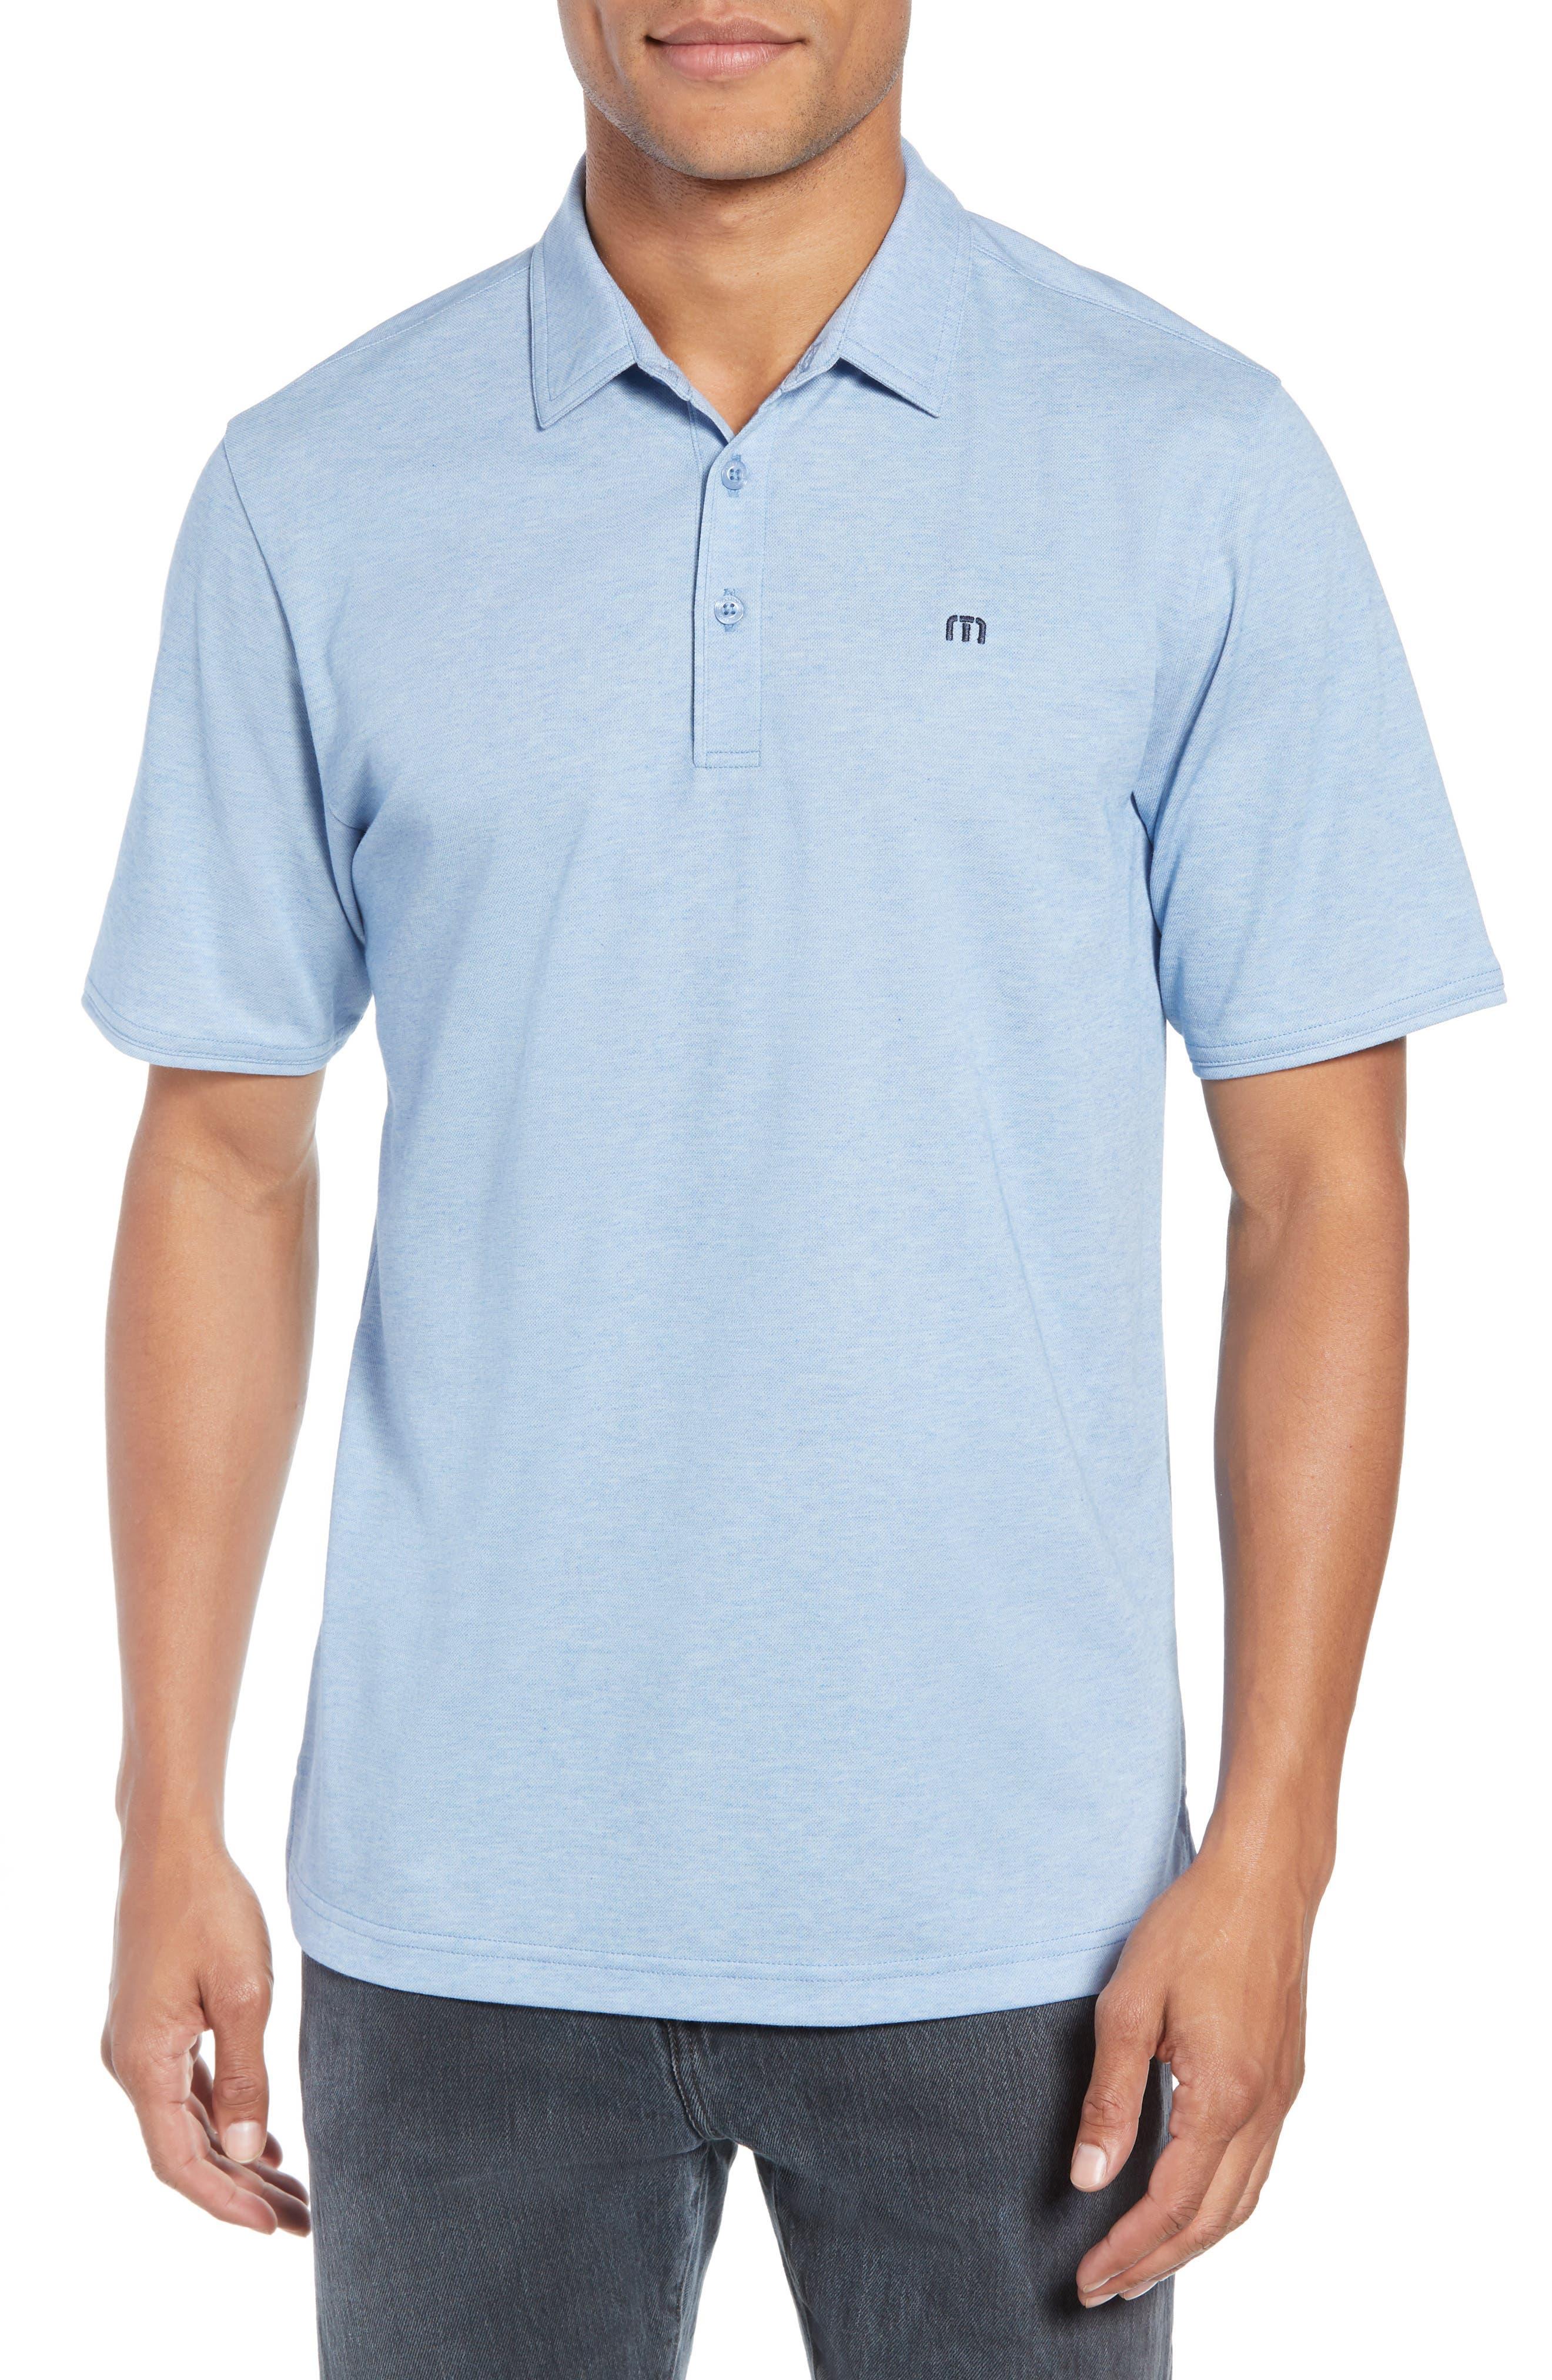 Travis Mathew Classy Jersey Polo, Blue